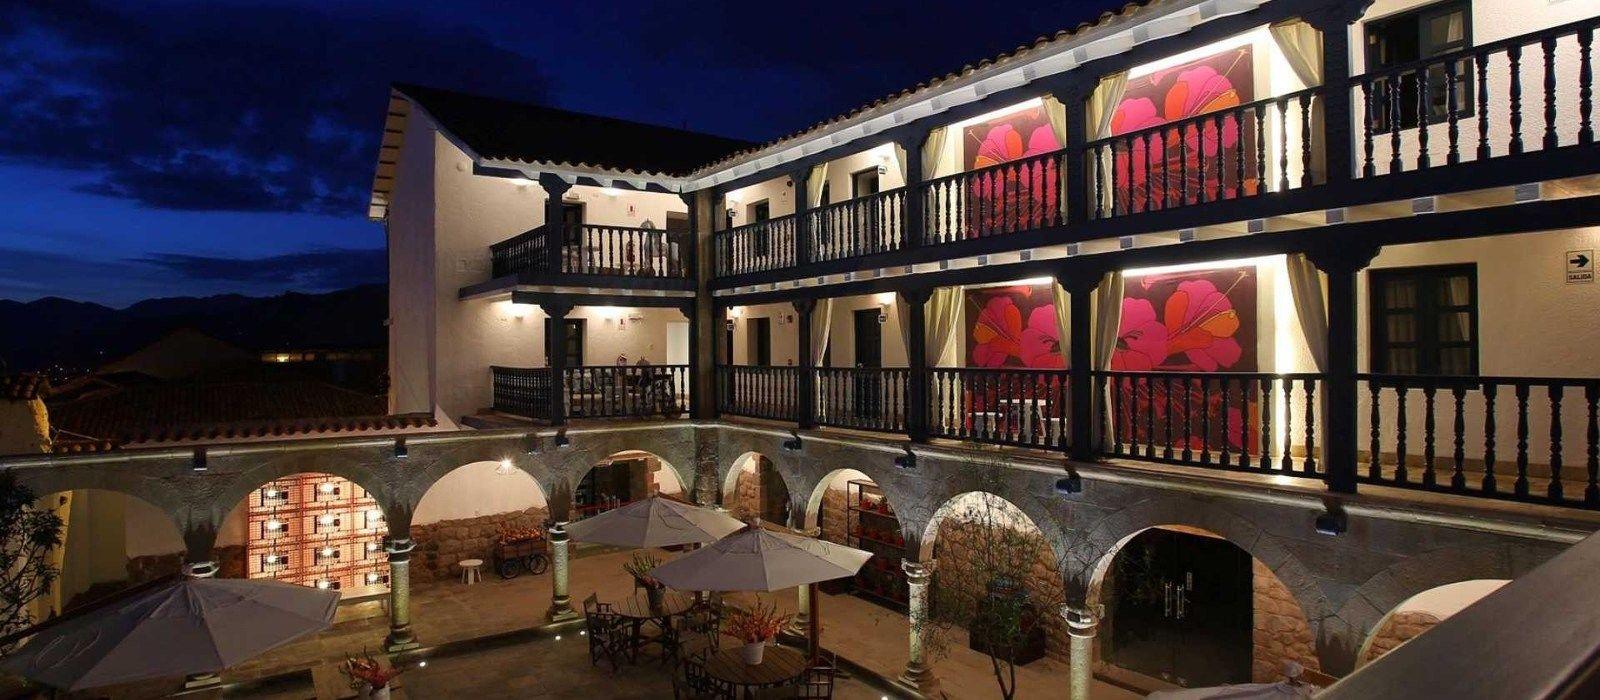 Hotel El Mercado Tunqui Peru